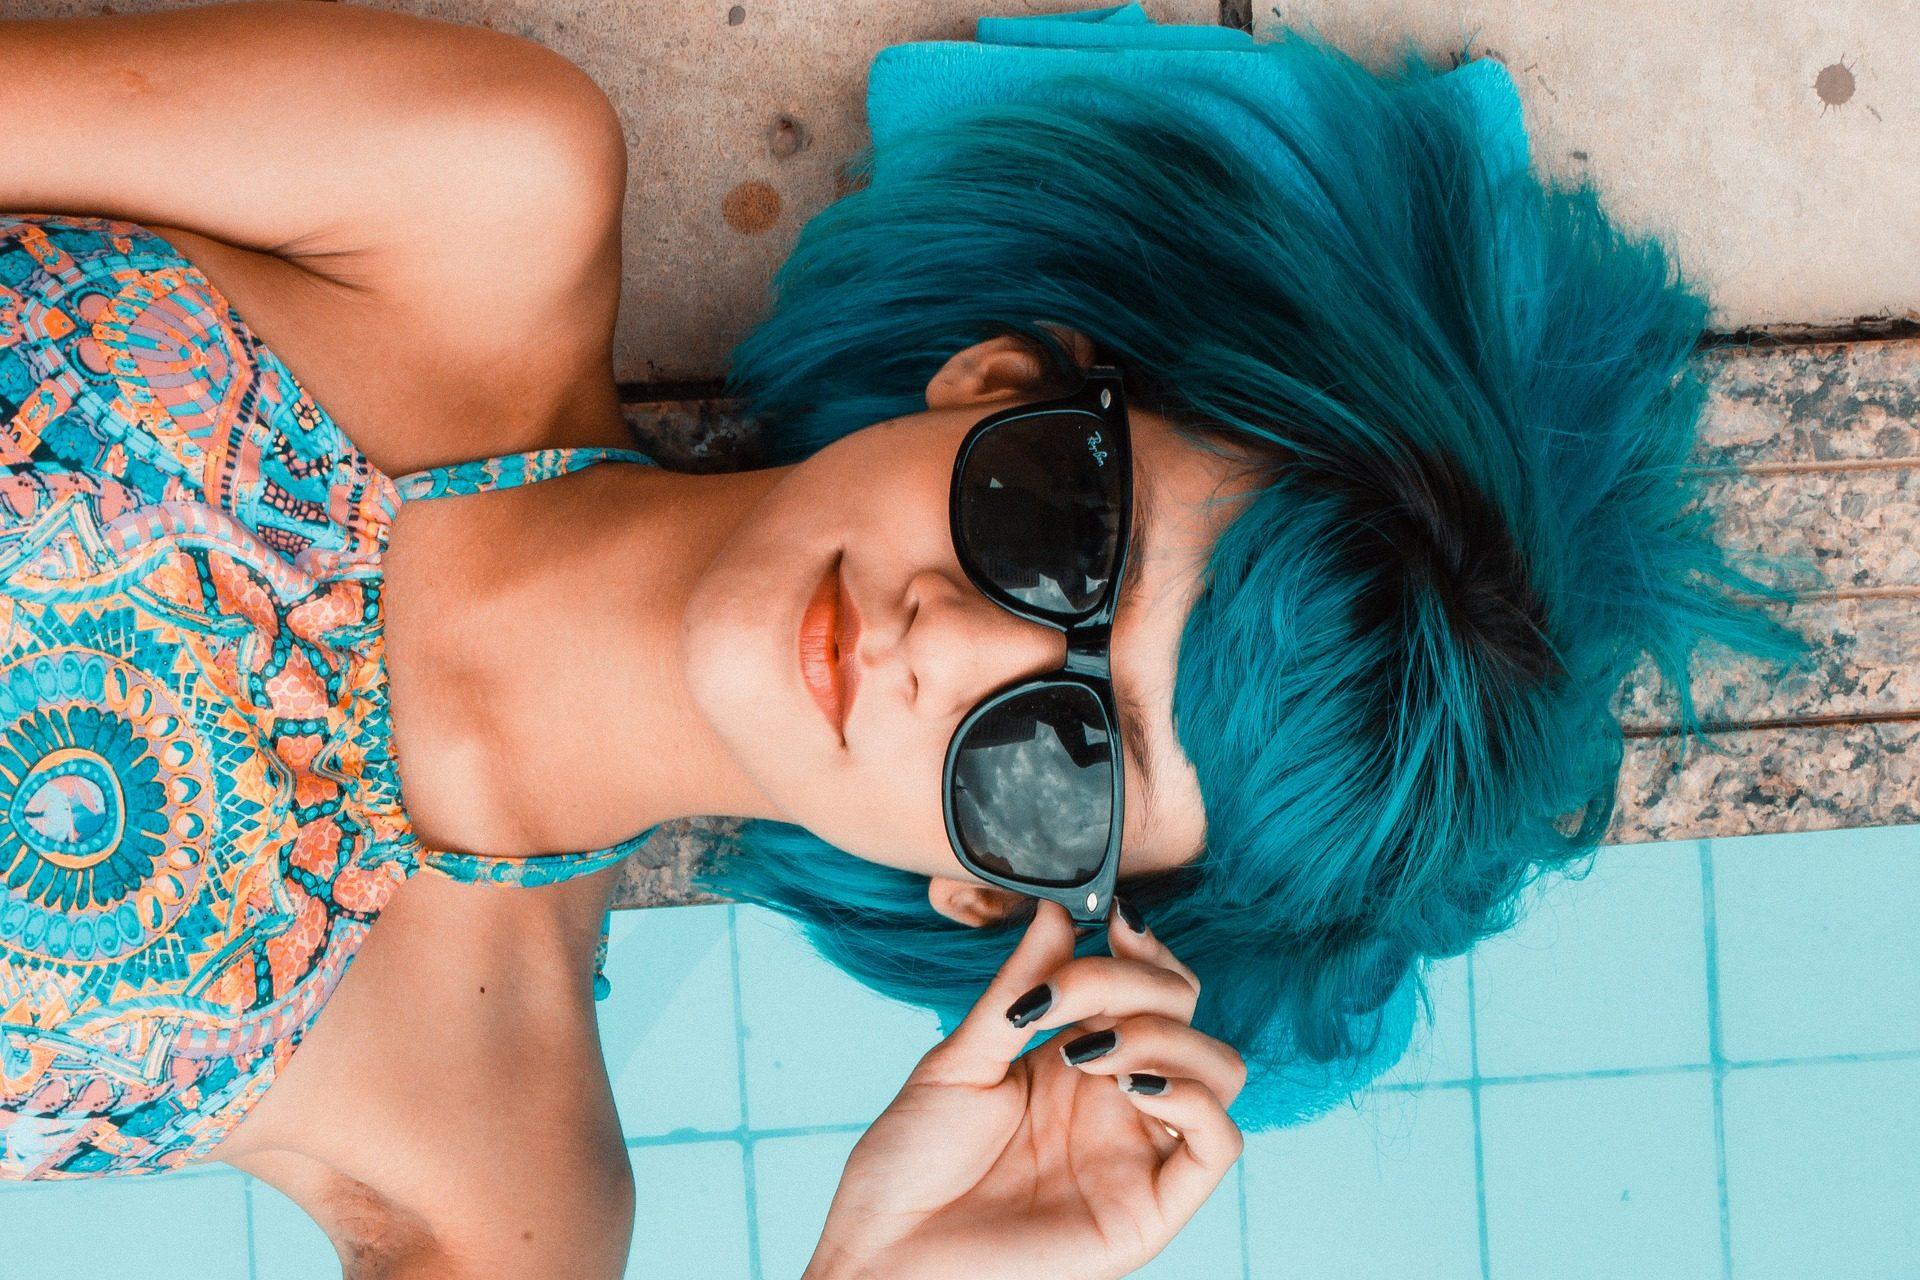 mujer, pelo, azul, gafas, vestido - Fondos de Pantalla HD - professor-falken.com